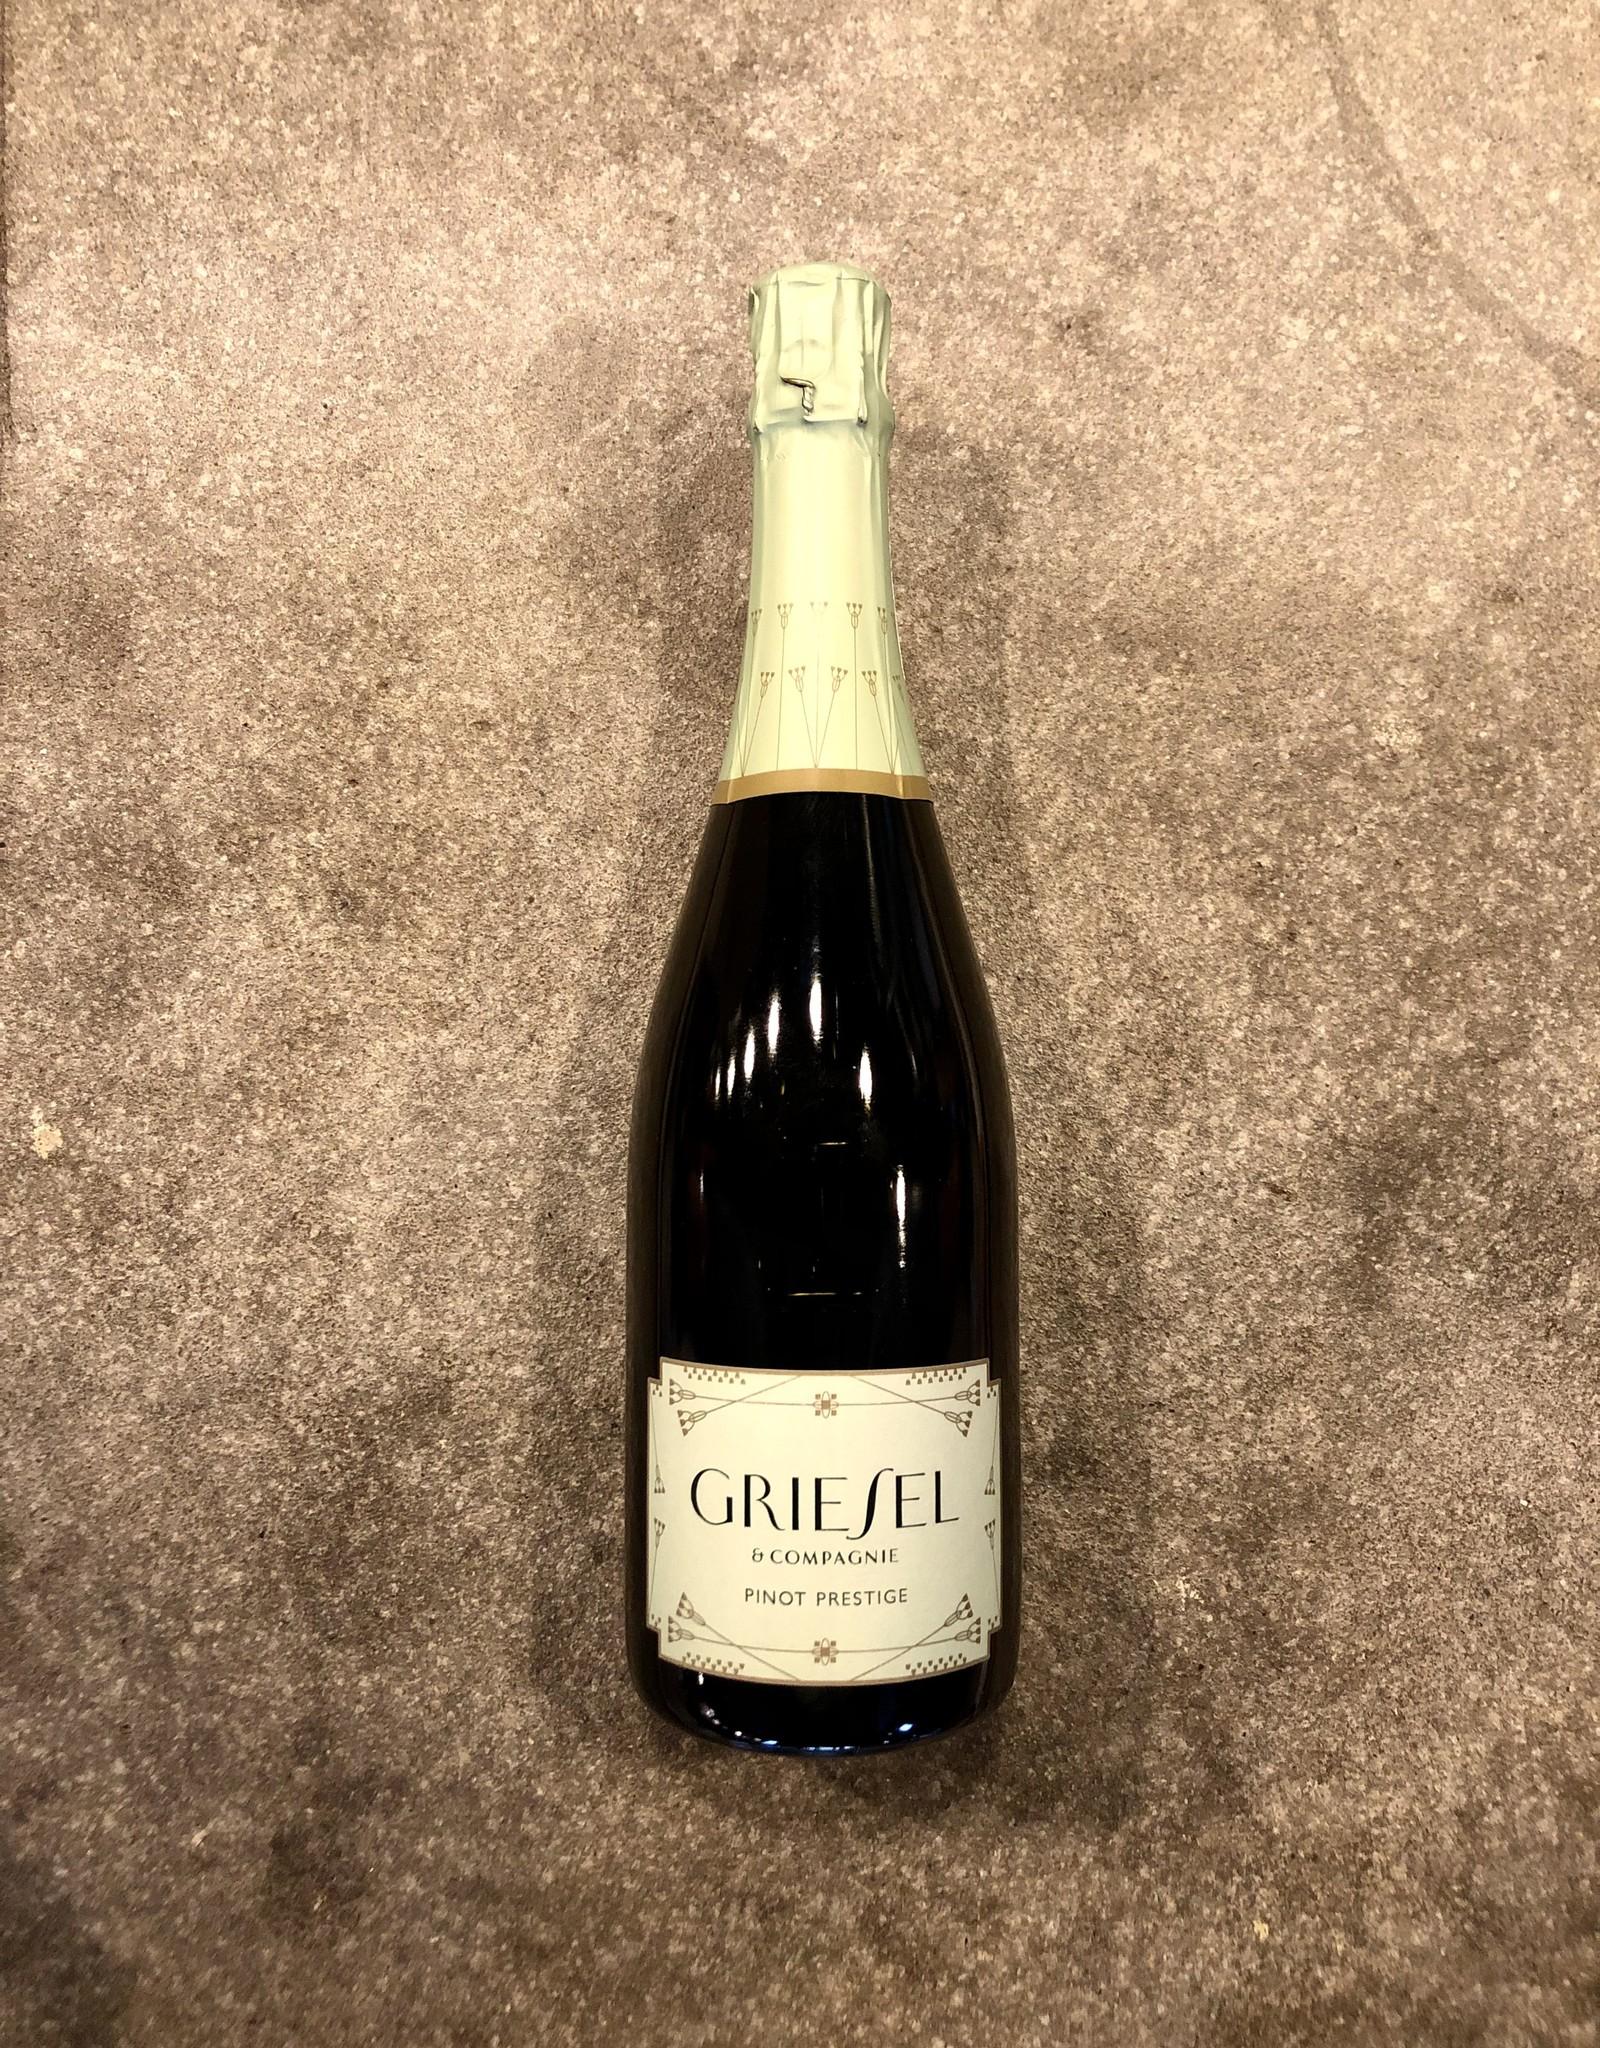 Griesel Sekt Pinot Prestige Brut Nature Magnum 2017